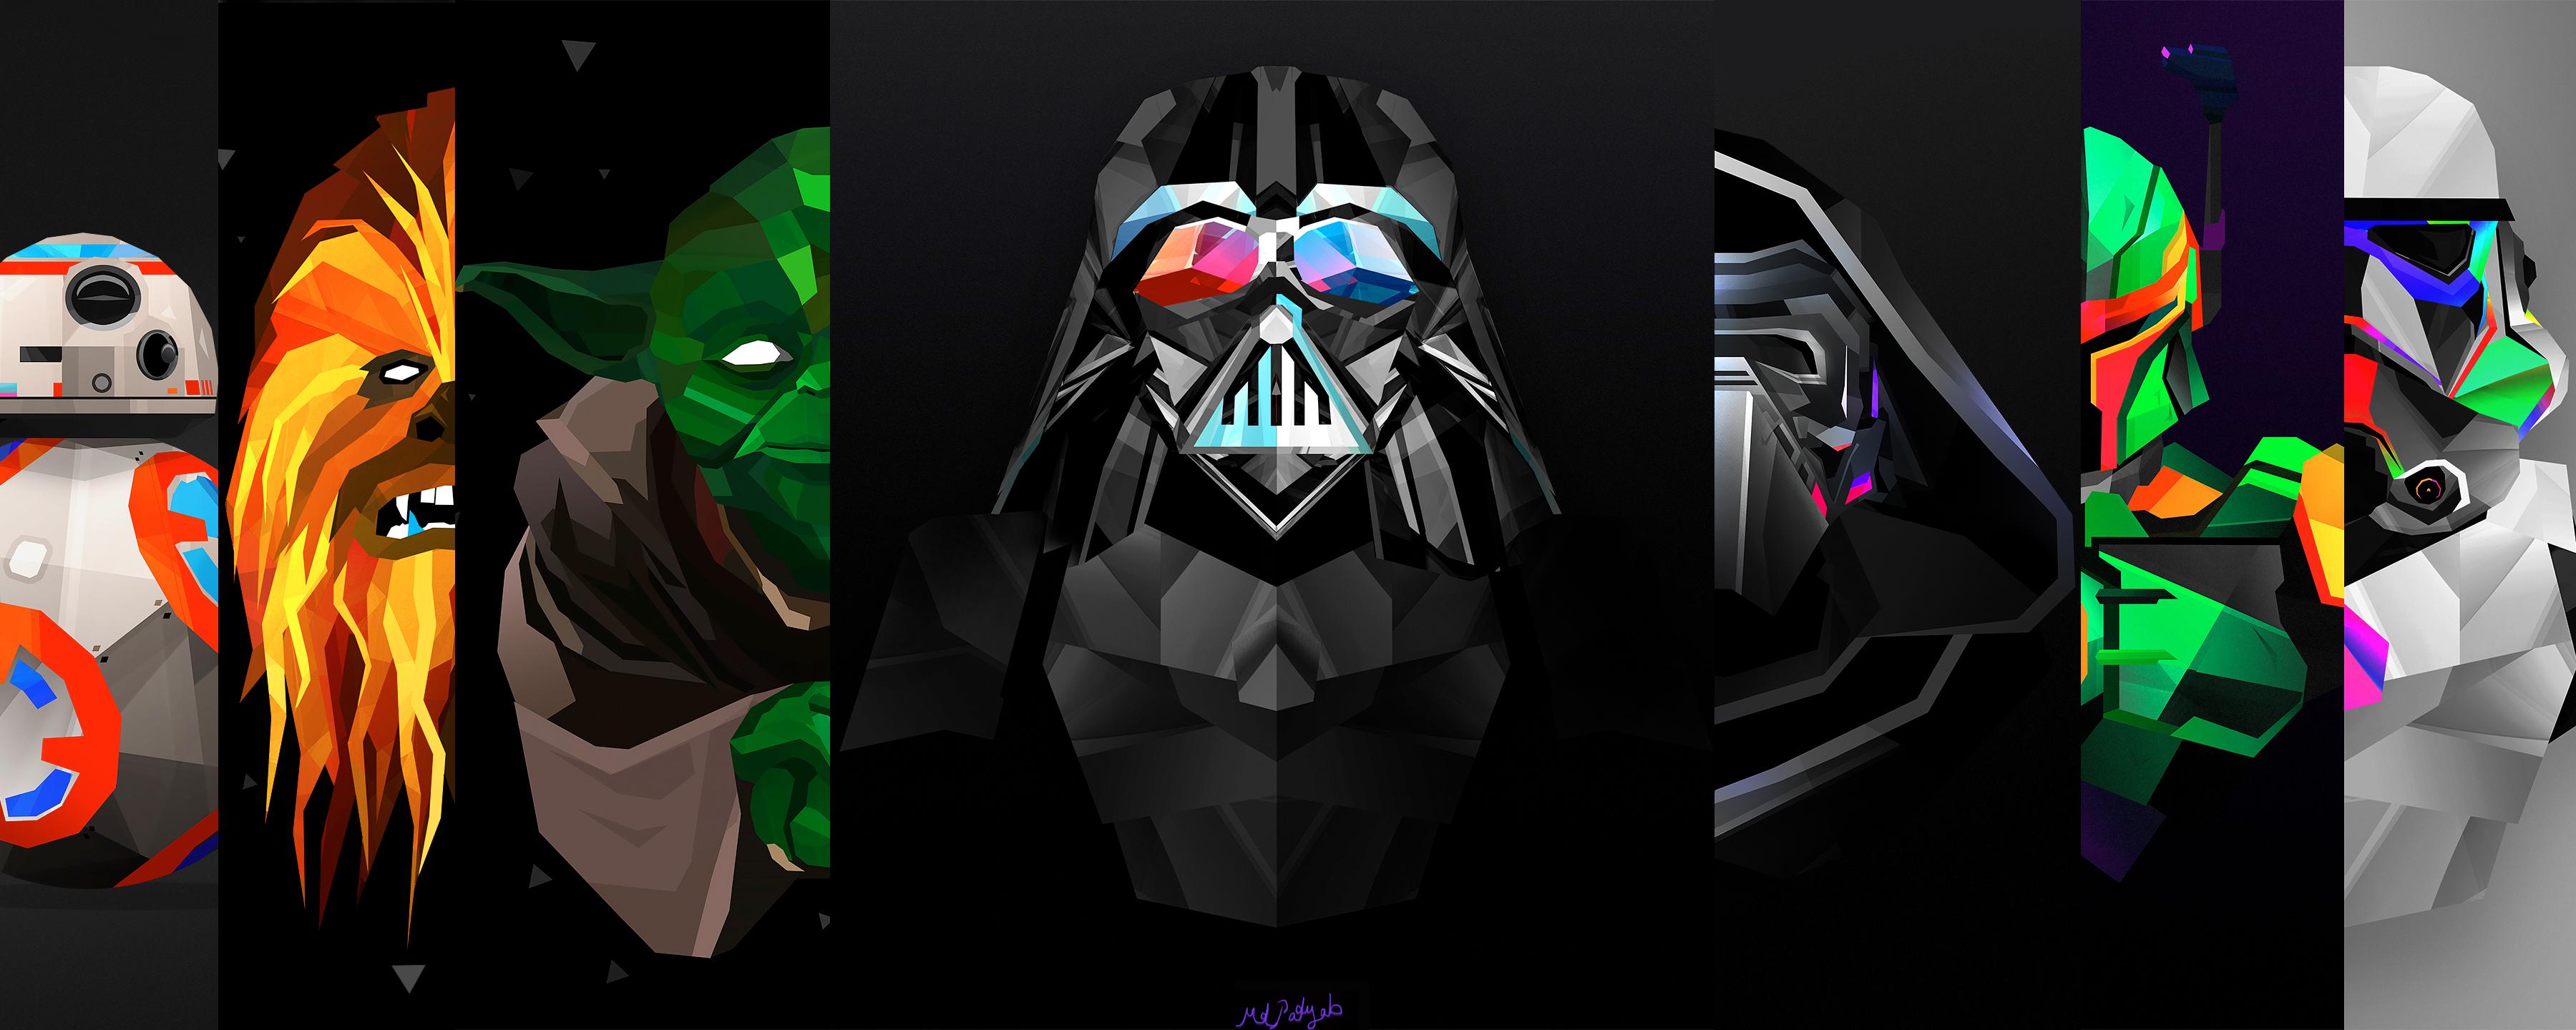 Star Wars Hd Wallpaper Background Image 3600x1440 Id 708084